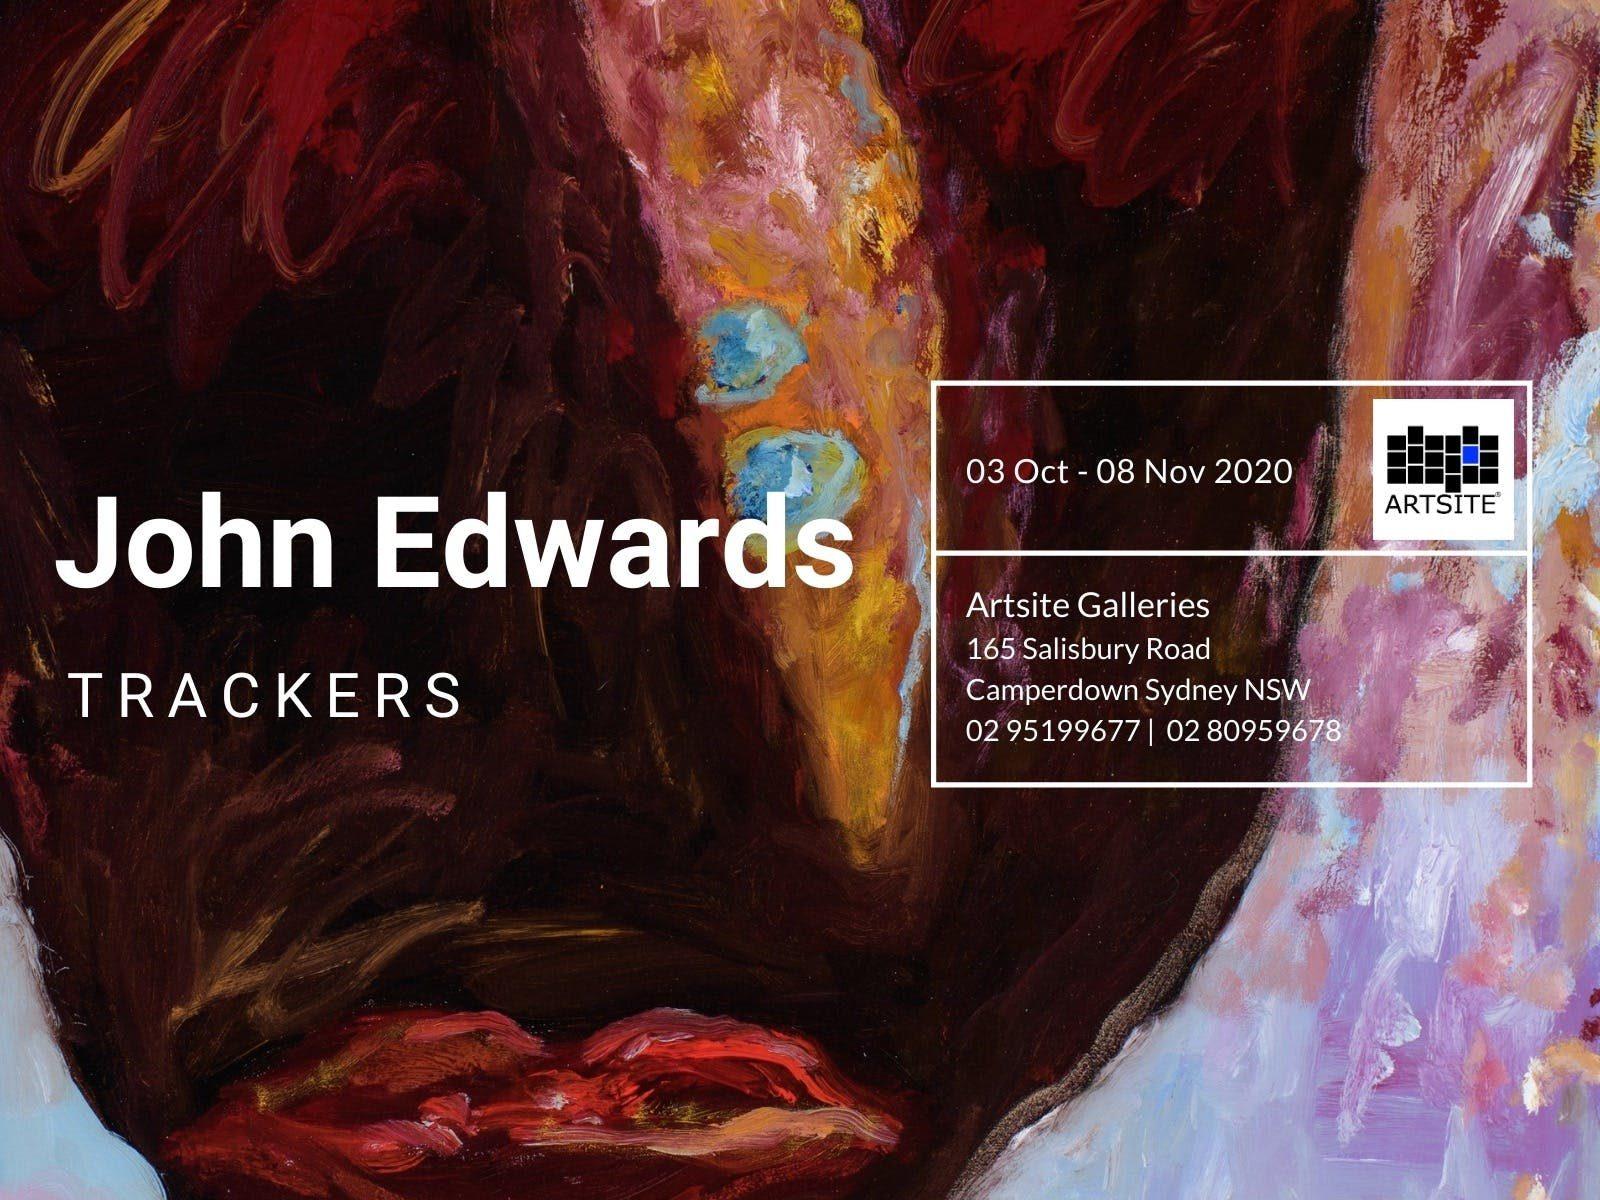 Trackers: John Edwards